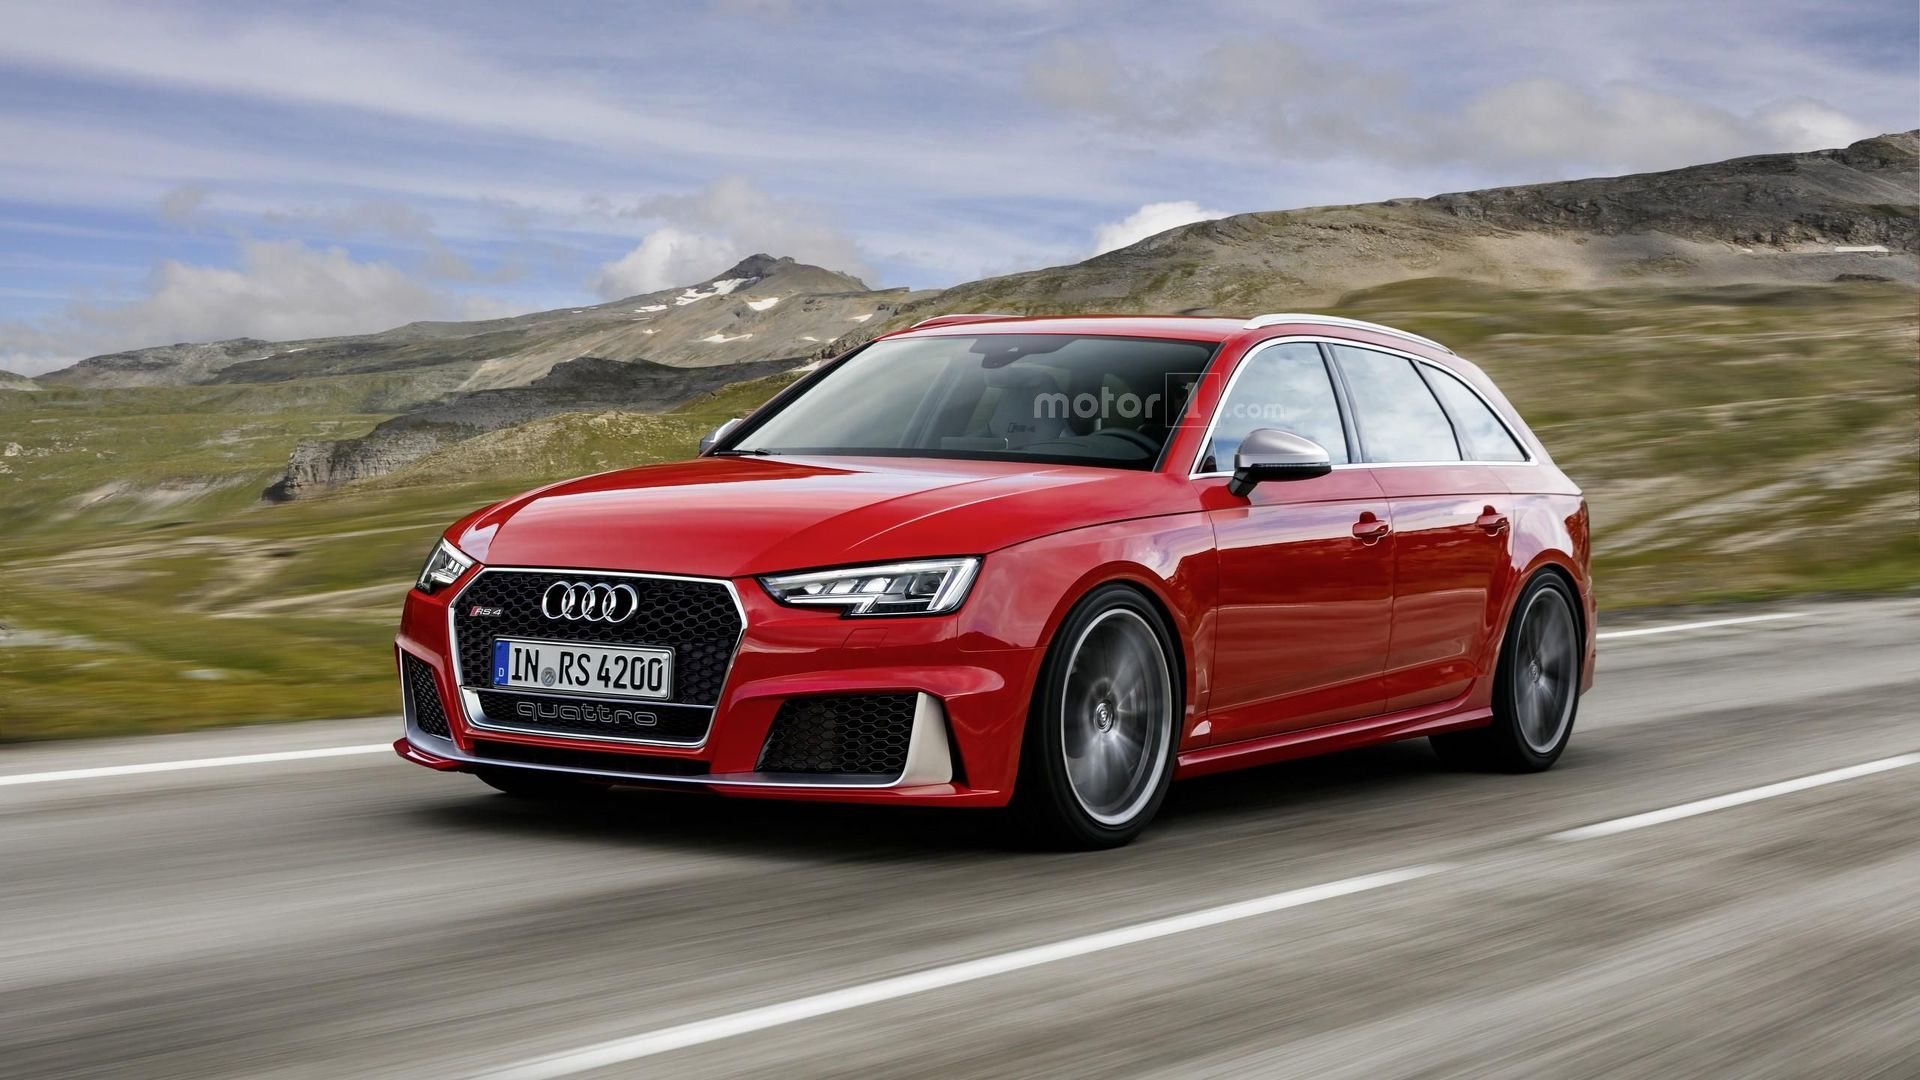 Audi Rs4 Avant Rs5 Coupe Sportback Specs Leaked Via Dealer Presentation